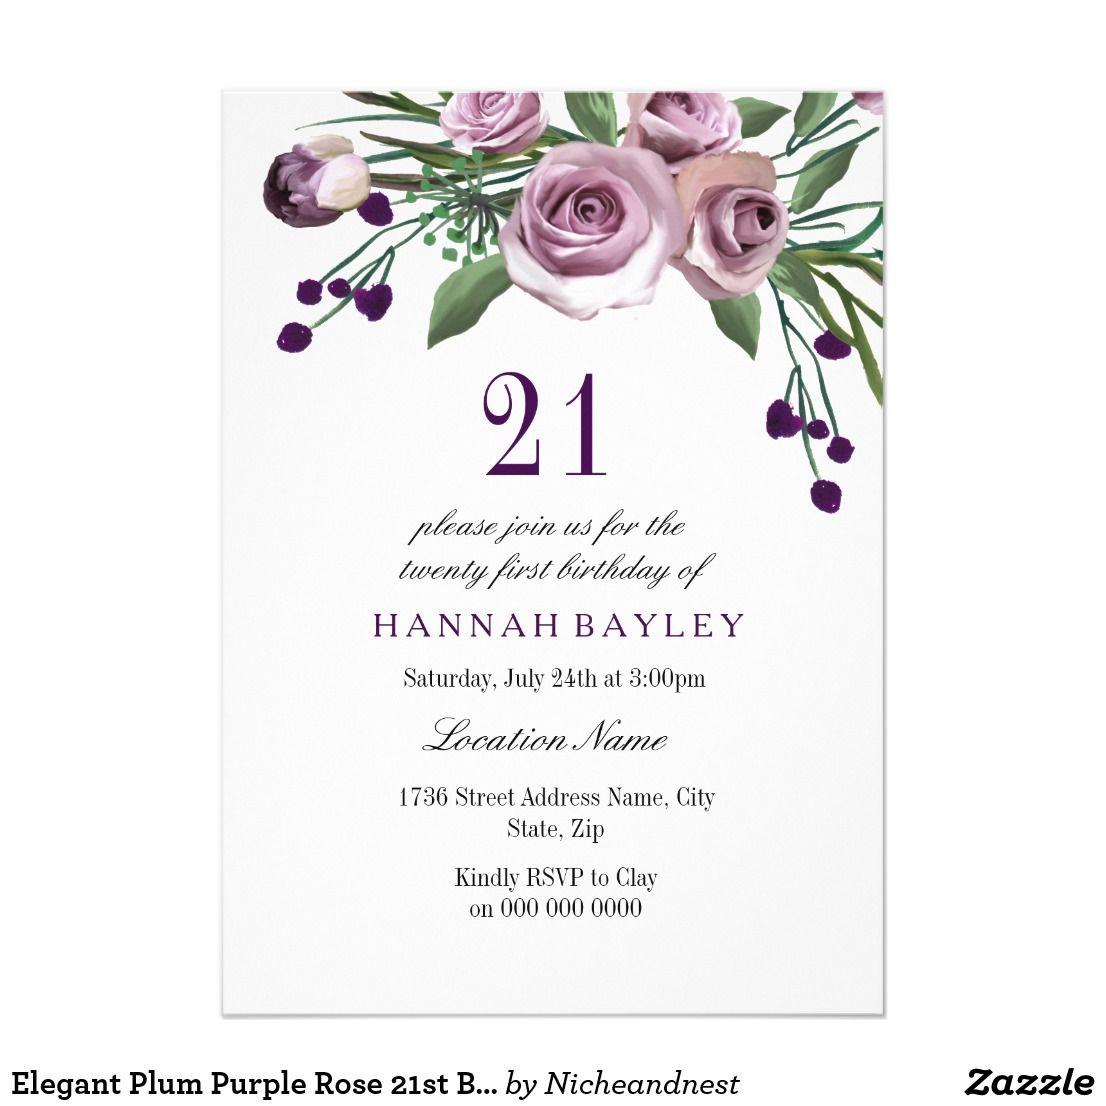 Plum Purple Rose 21st Birthday Invitation